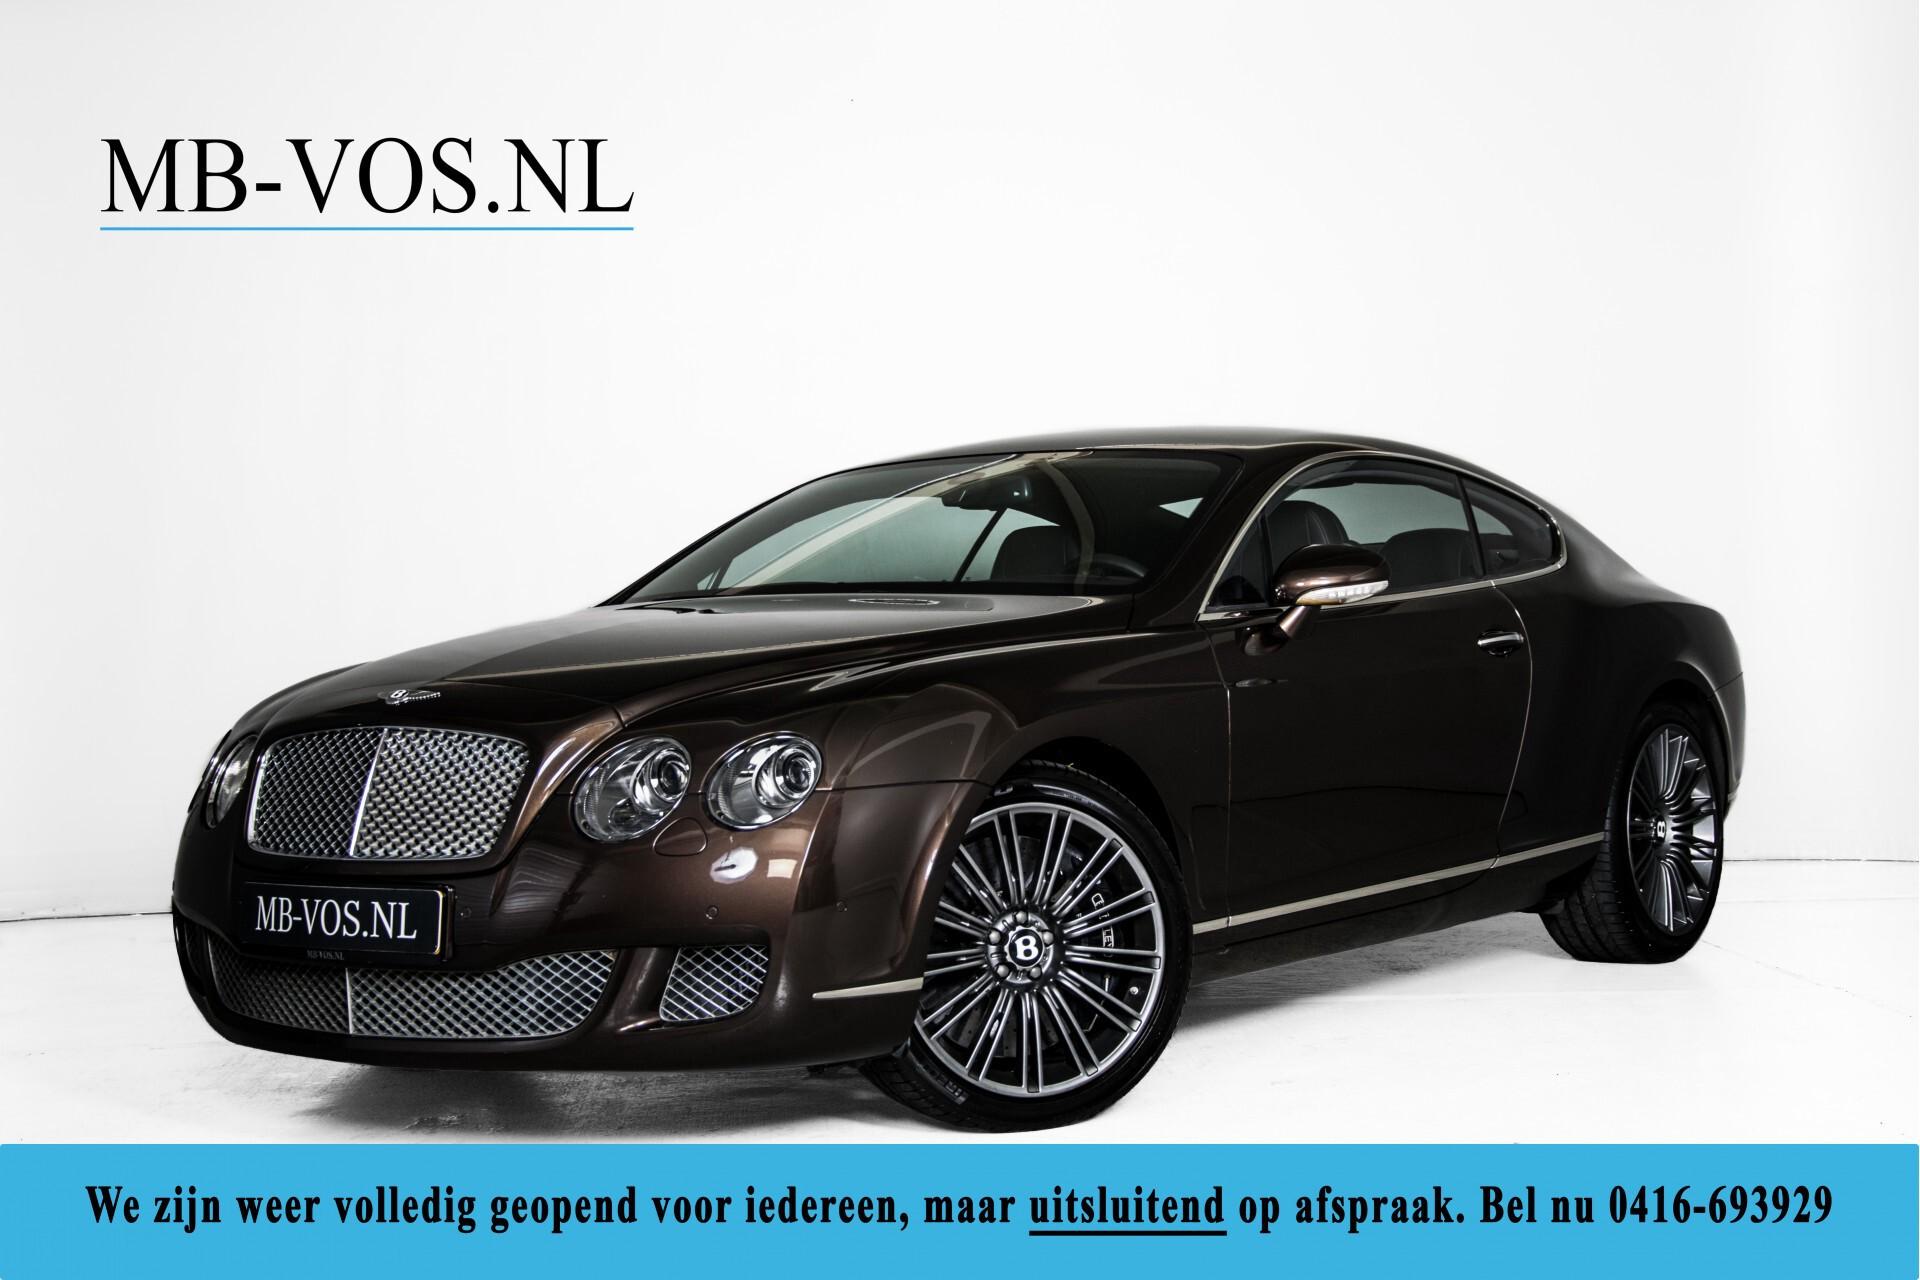 Bentley Continental GT 6.0 W12 GT Speed Ceramic Brakes/Mulliner/Standkachel/Keyless Aut6 Foto 1